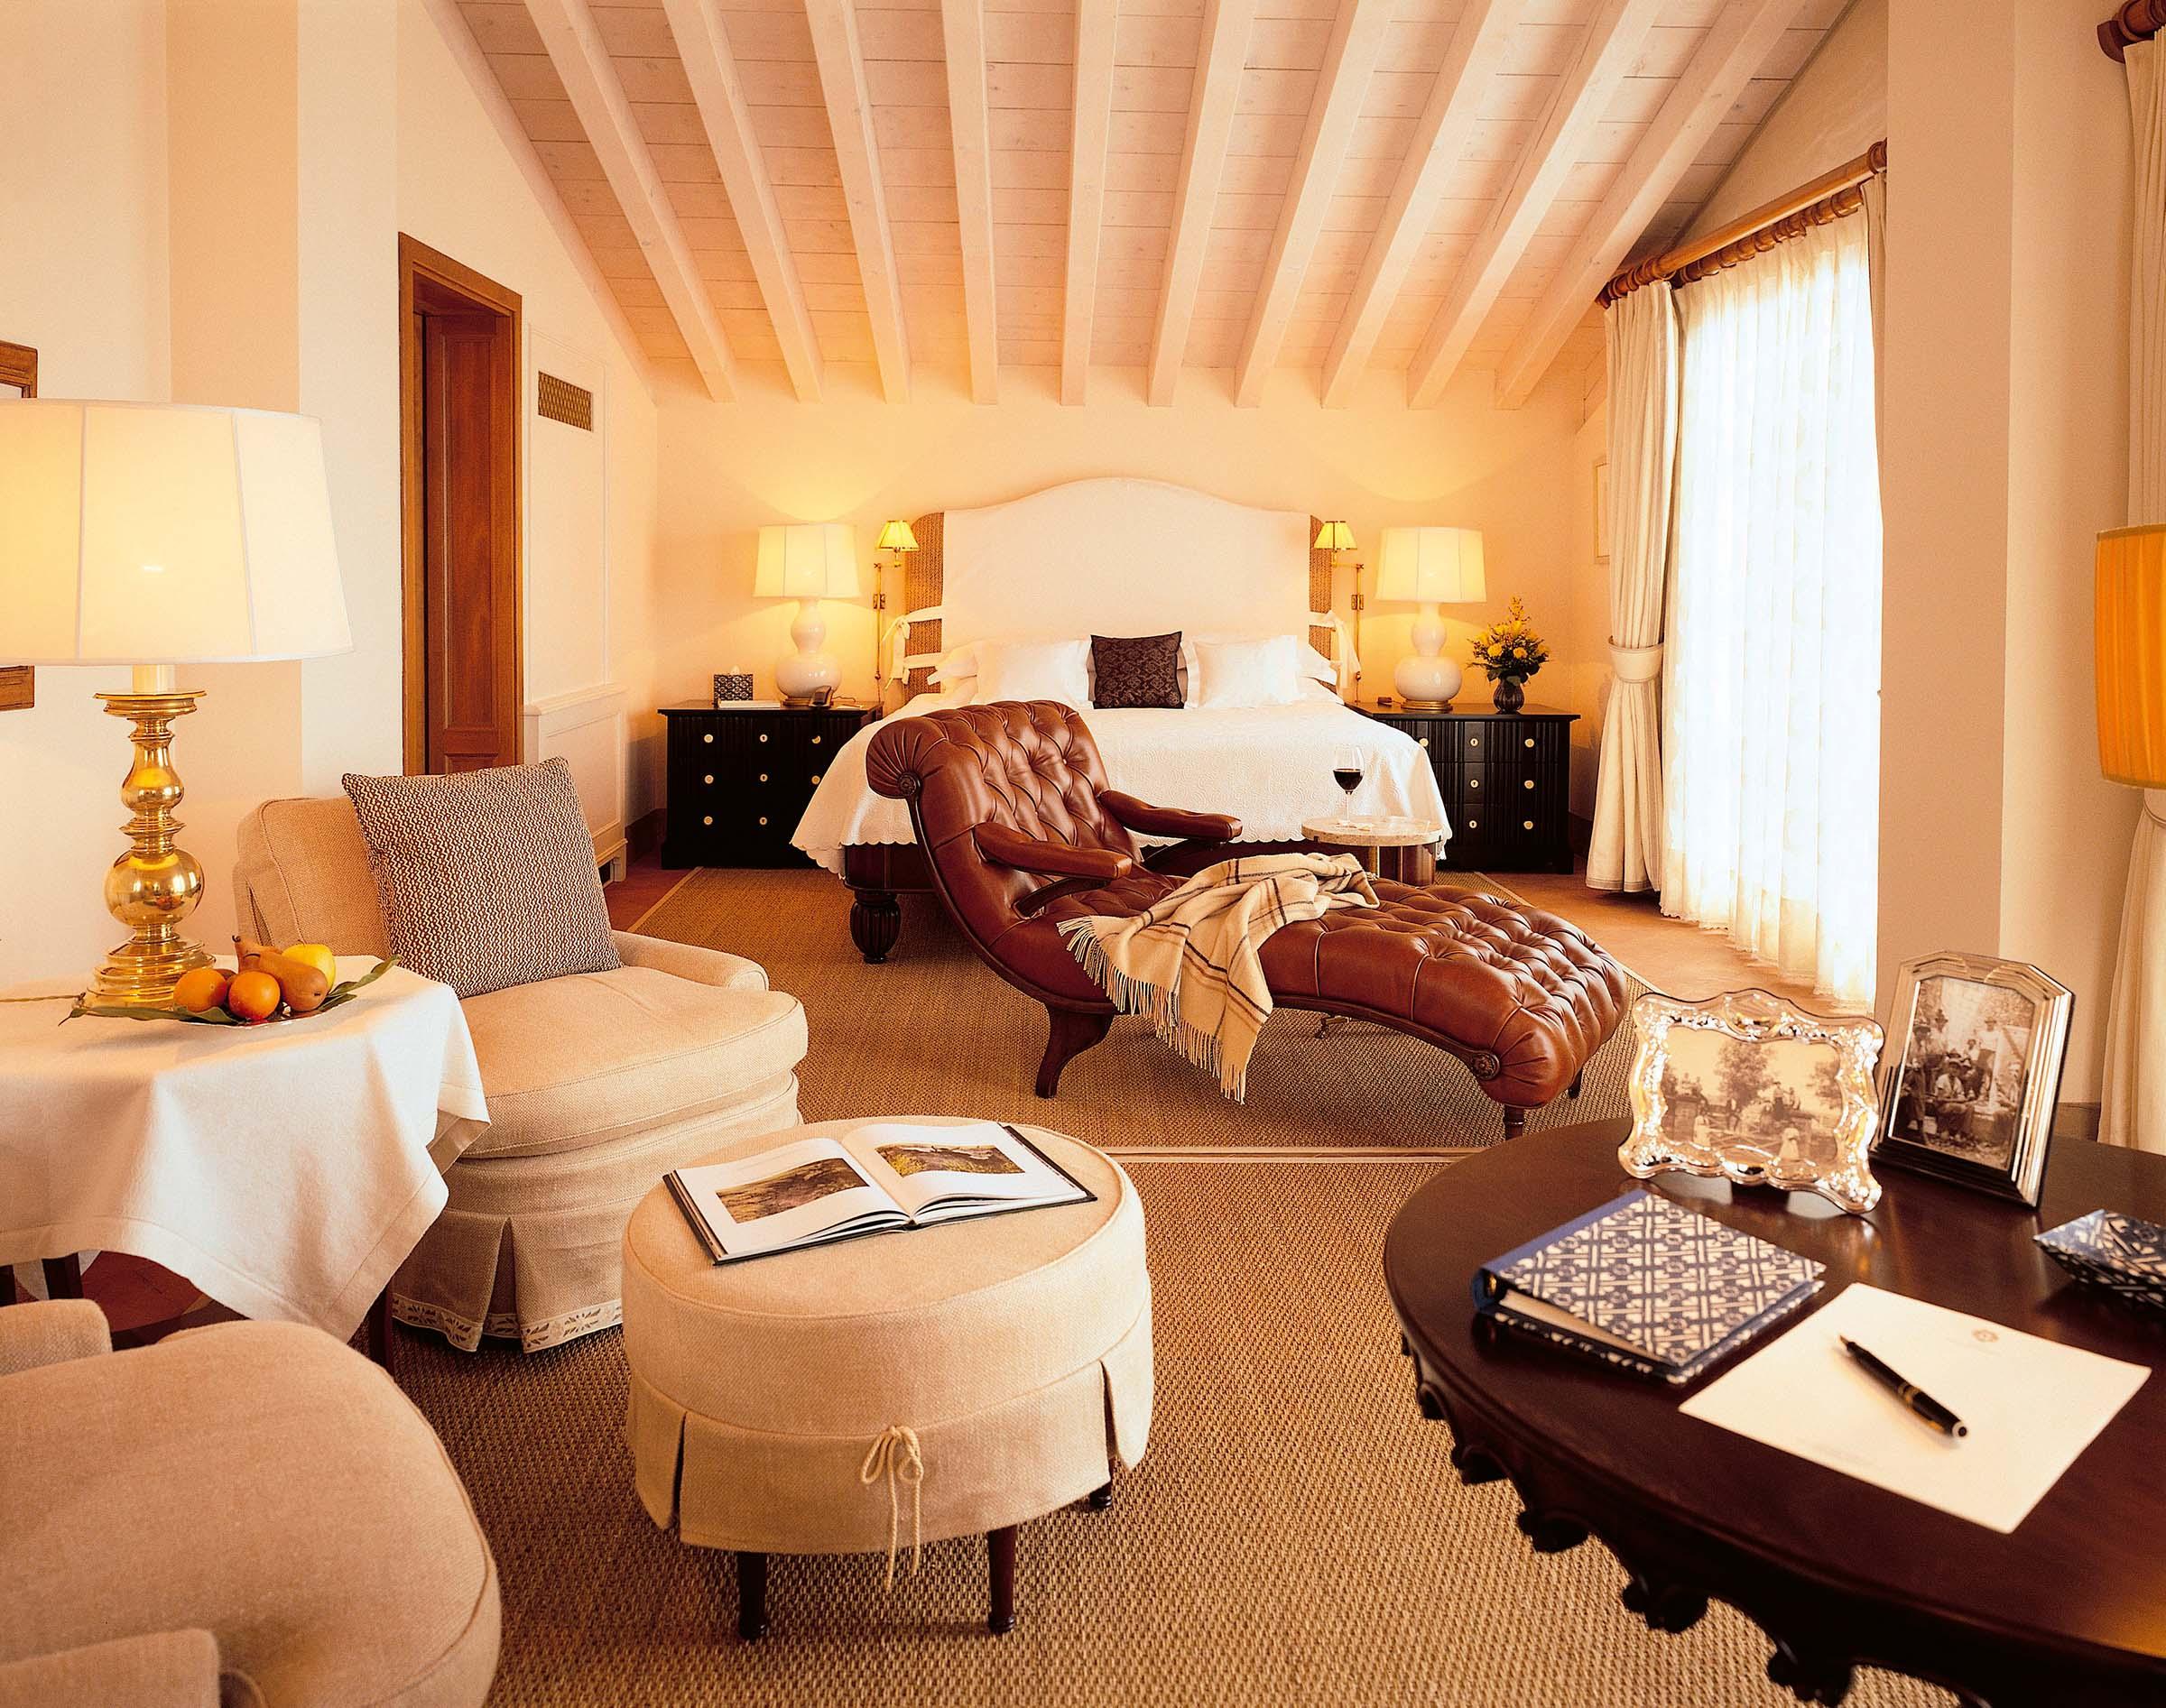 villa_feltrinelli_junior_suite_casa_rustica